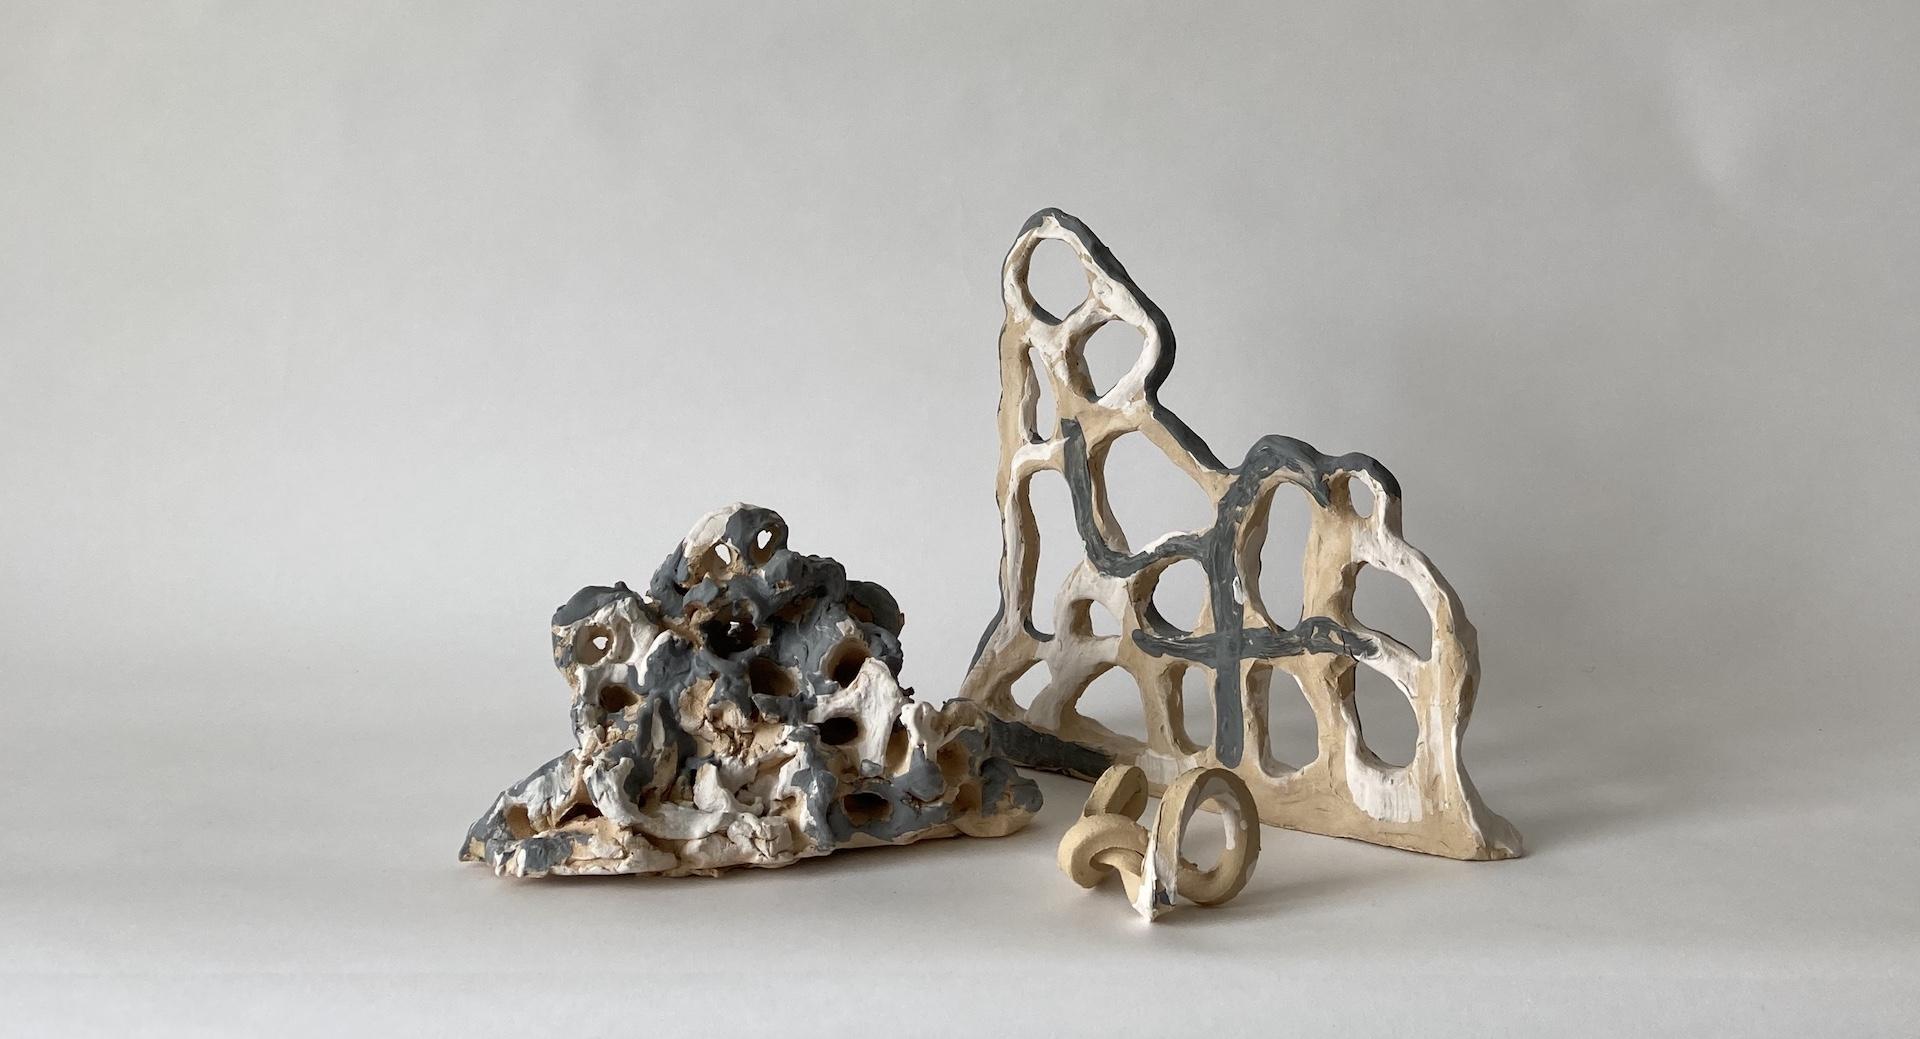 Ellie Redfern, Jessica Parnell & Gareth Barker's ceramics from Late Works SLIP.